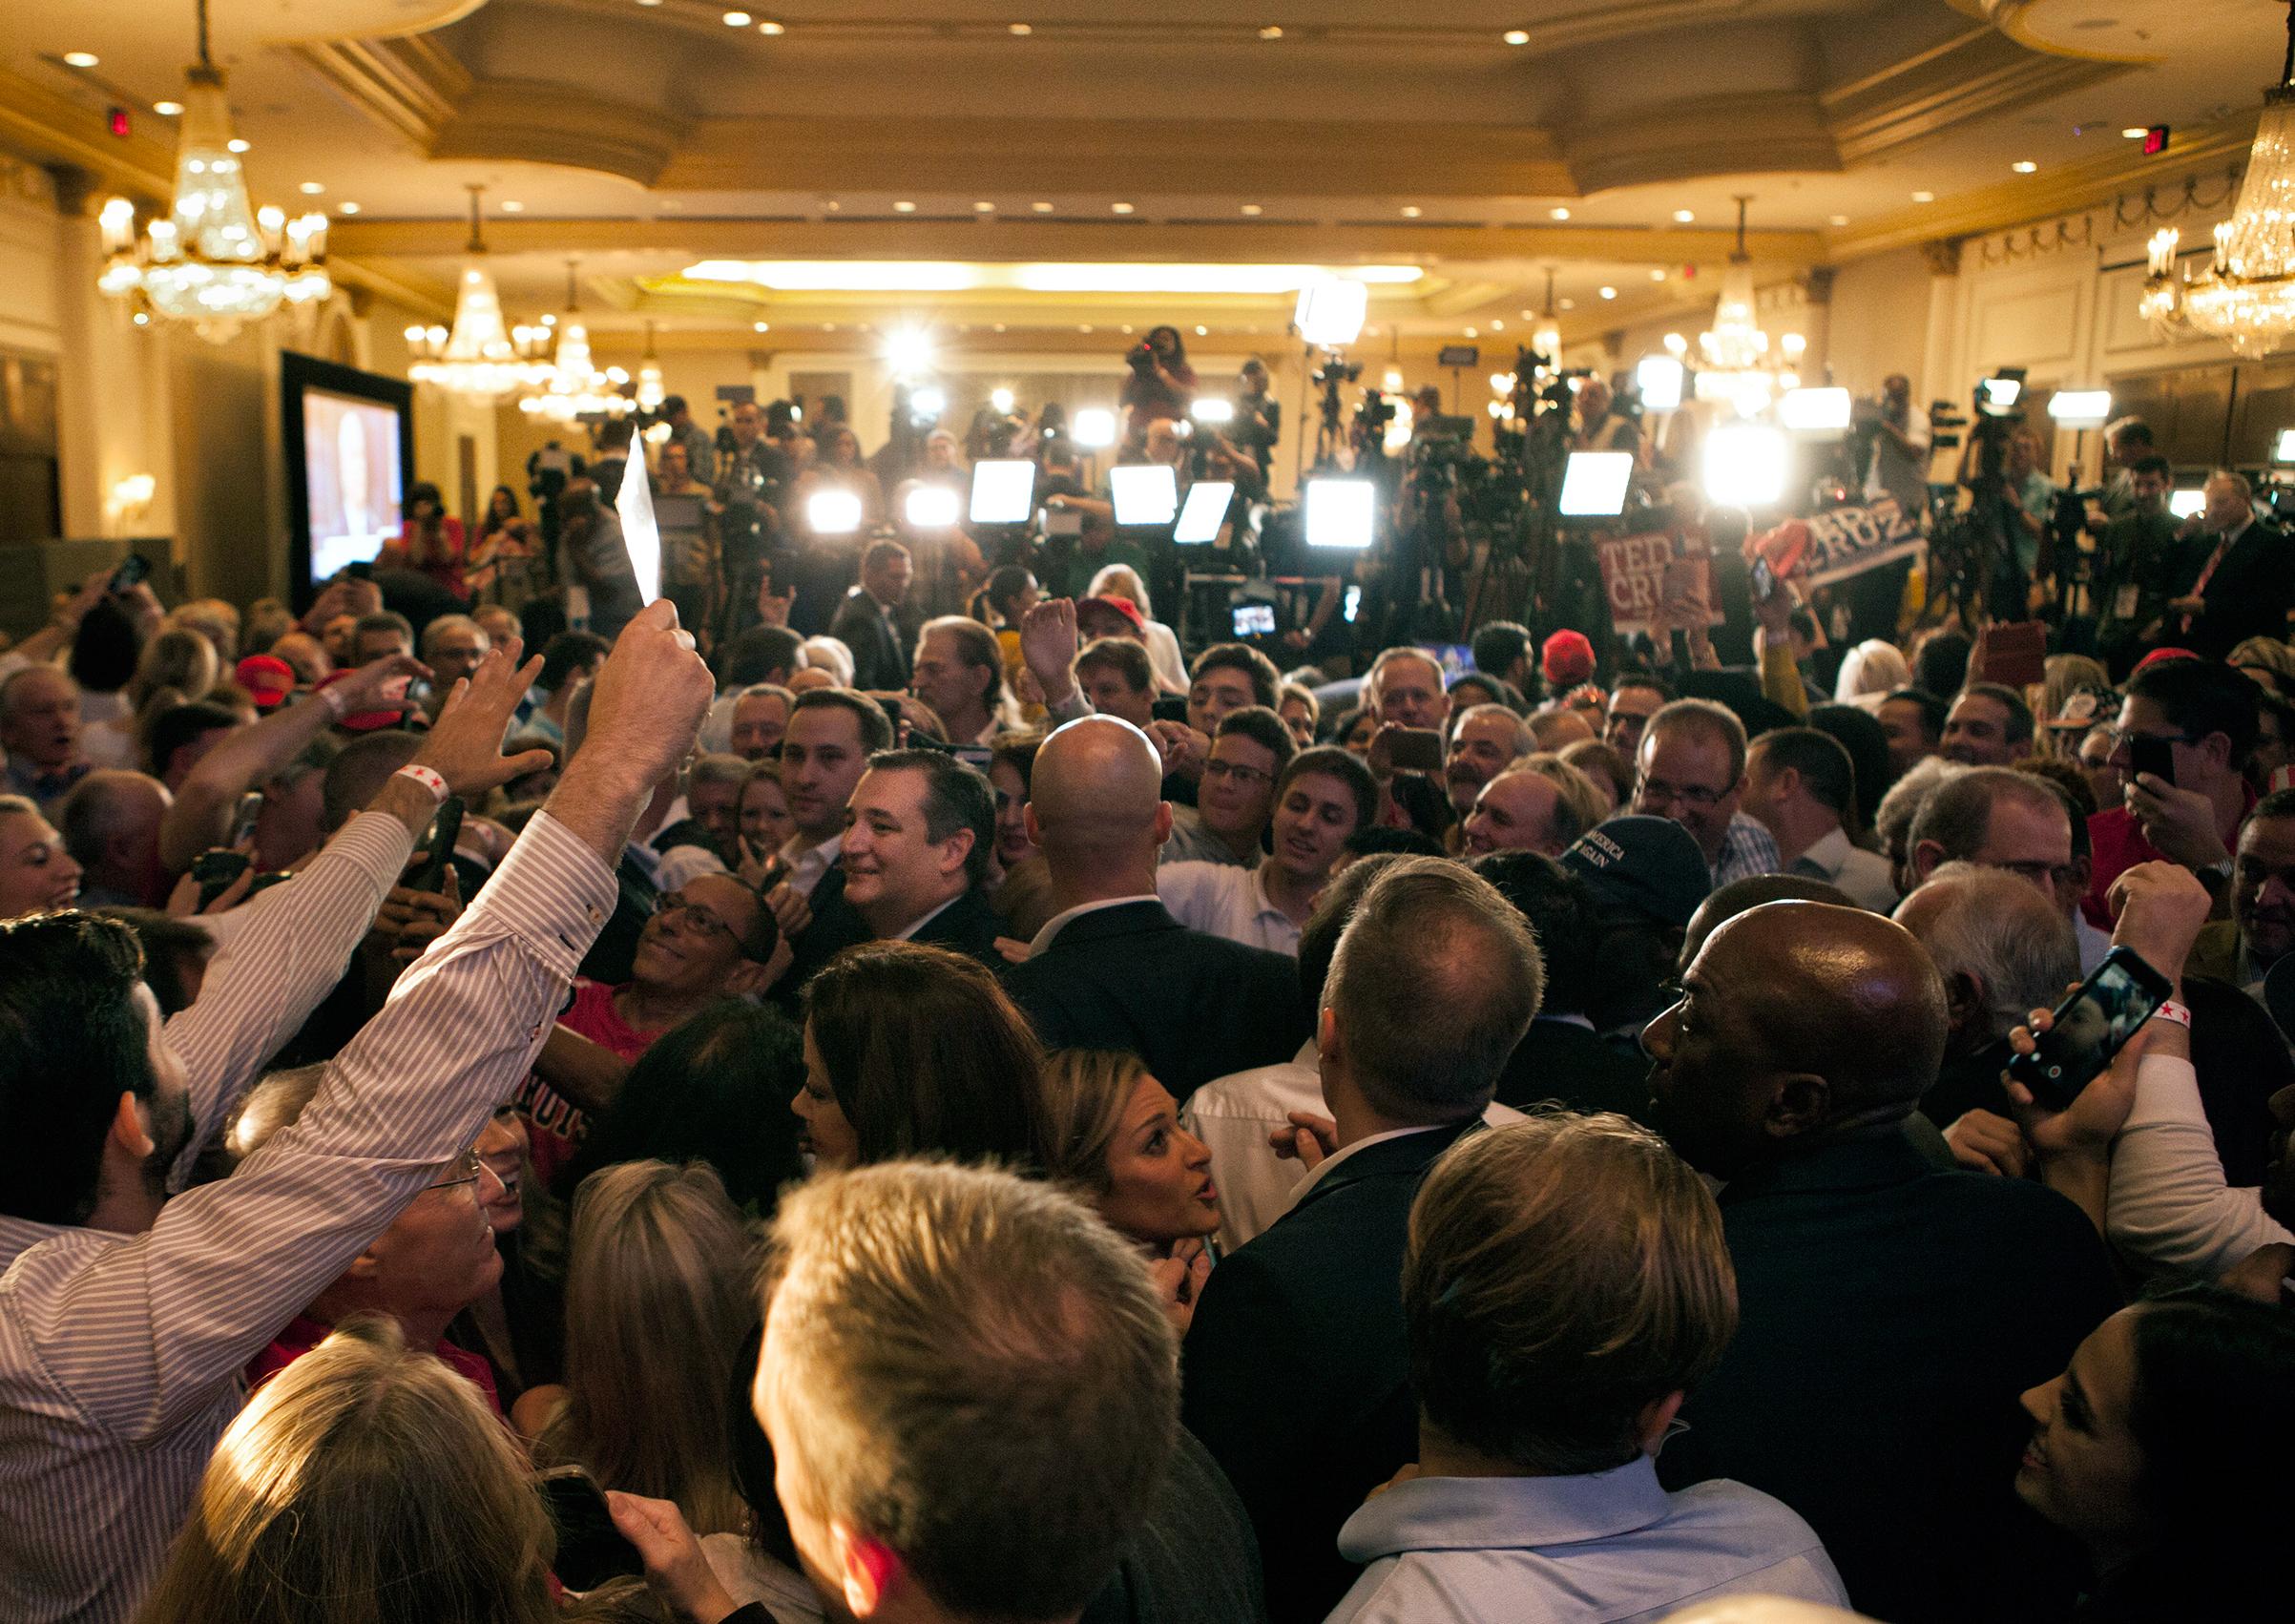 Senator Ted Cruz greets the crowd after fending off Representative Beto O'Rourke's challenge